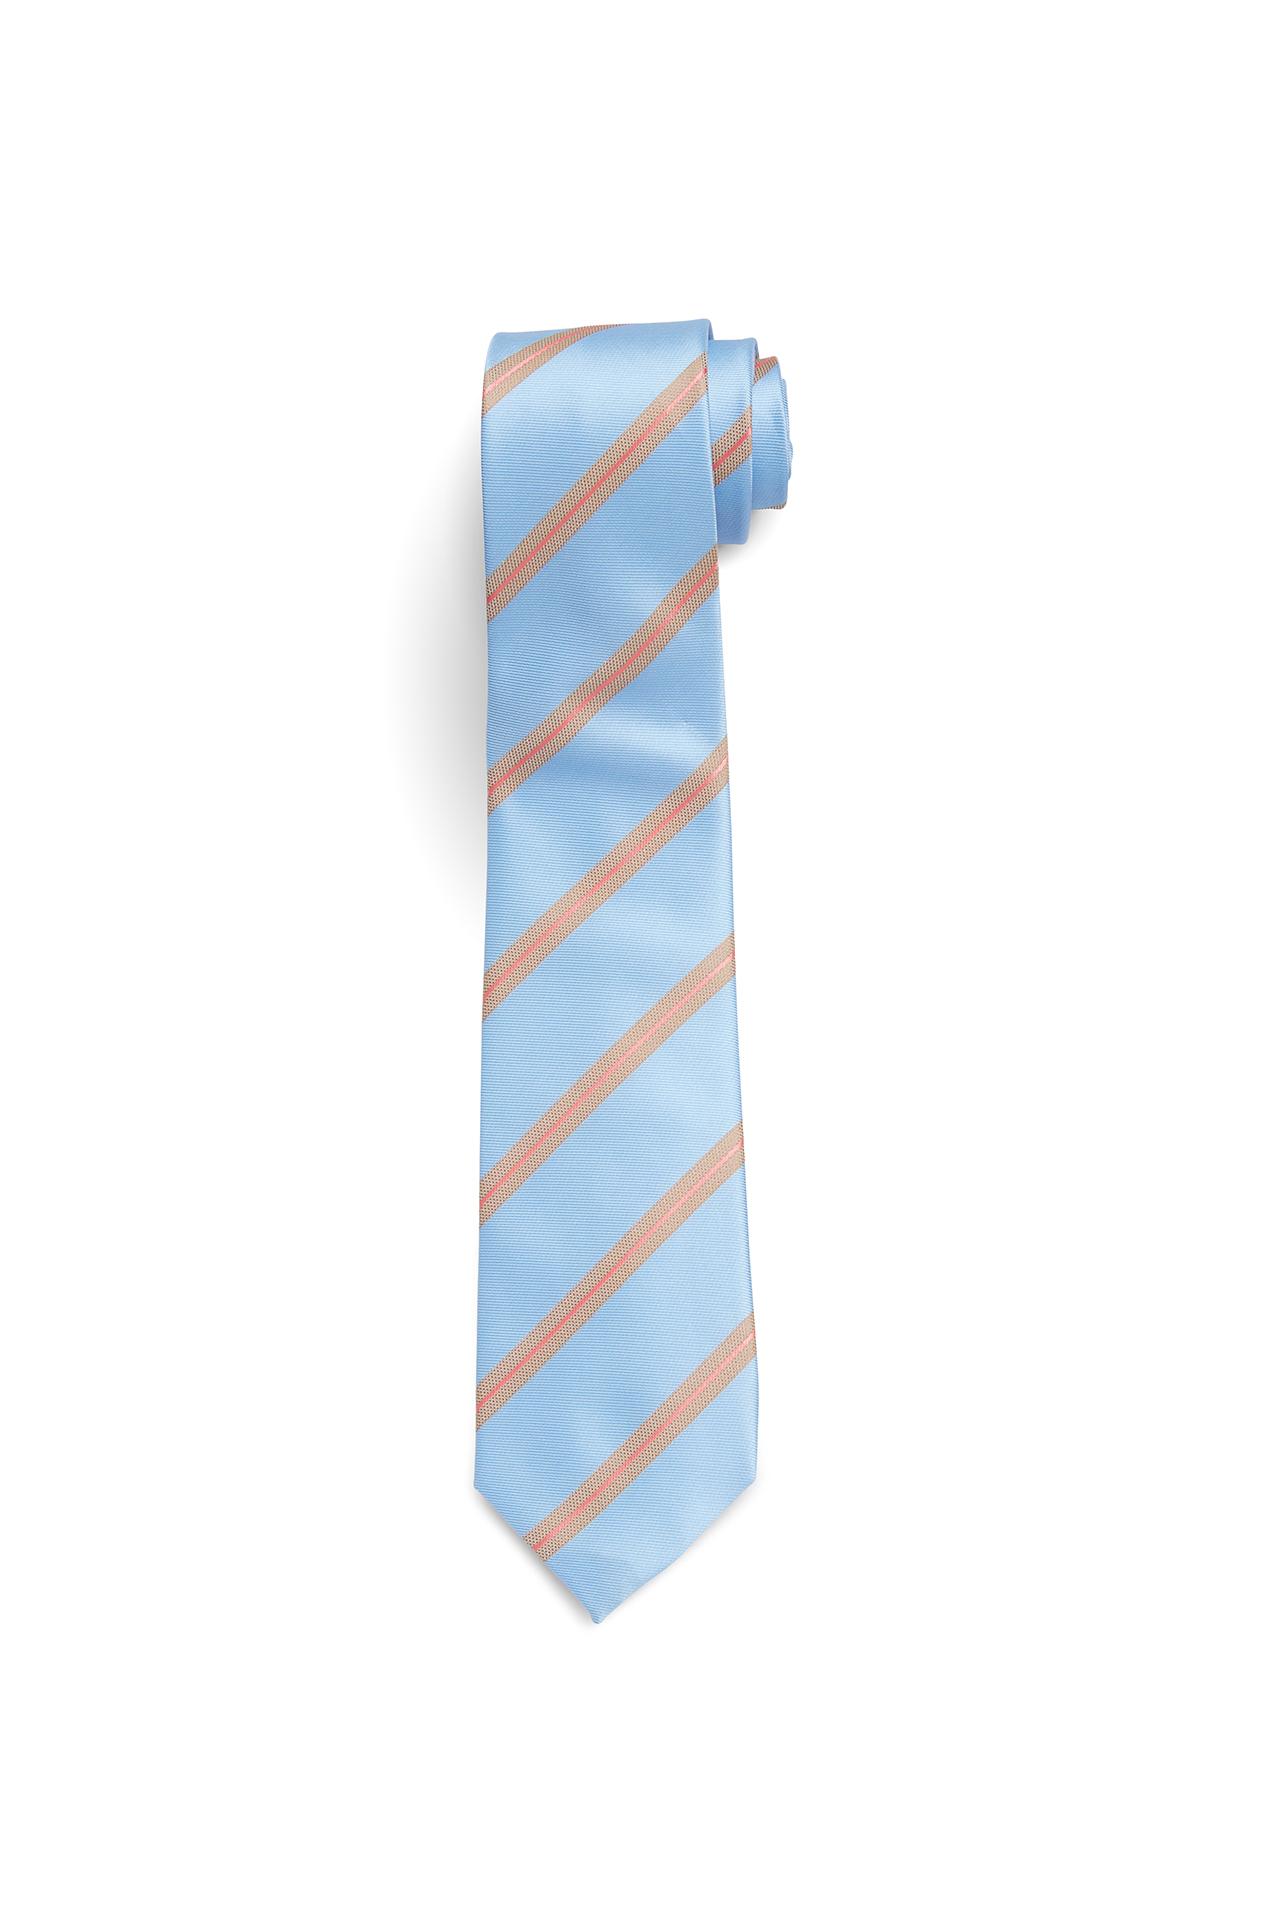 Light Blue with Salmon Stripe Tie